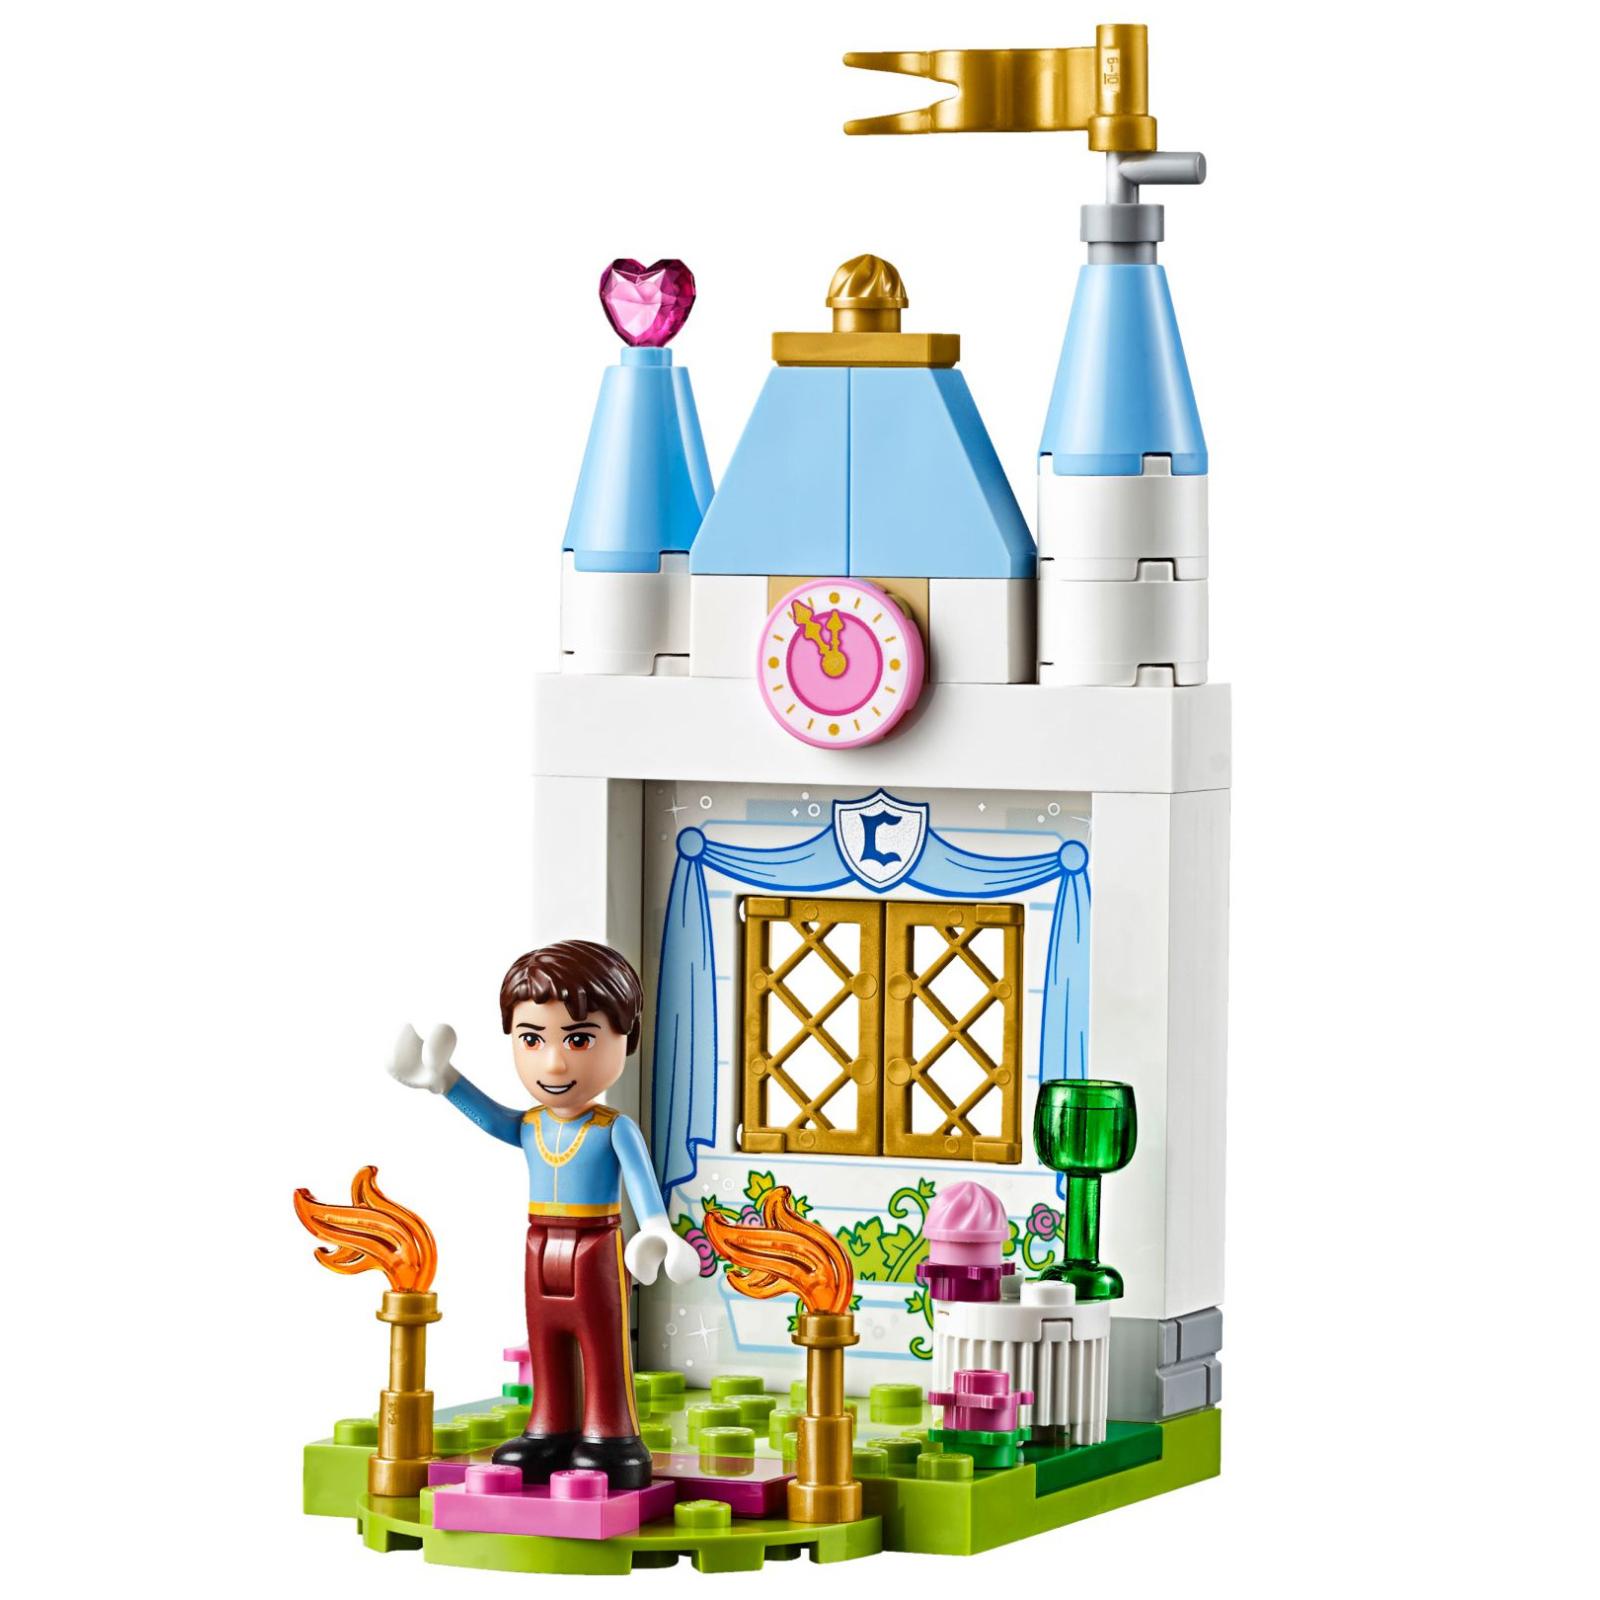 Конструктор LEGO Juniors Карета Золушки (10729) изображение 4